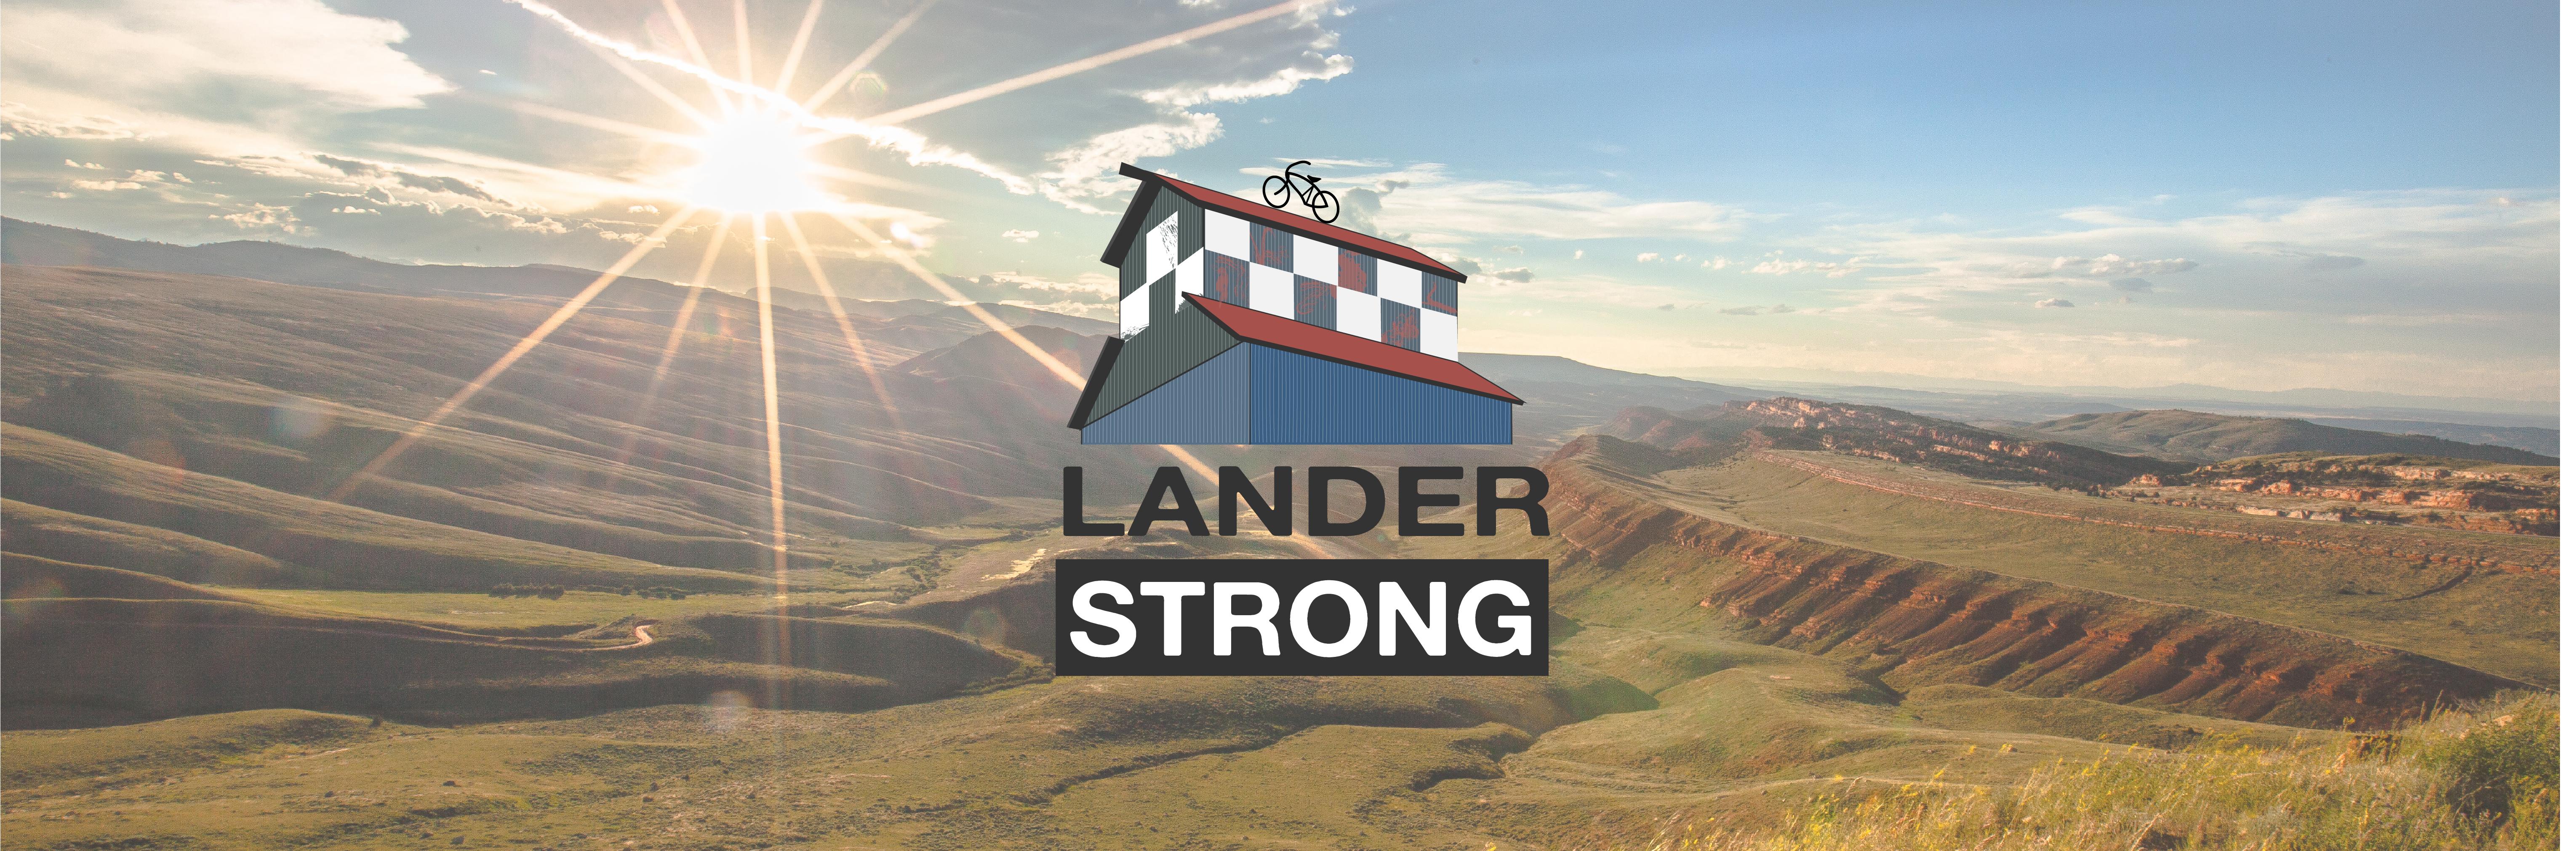 Lander Strong OSM Web Cover Image-02